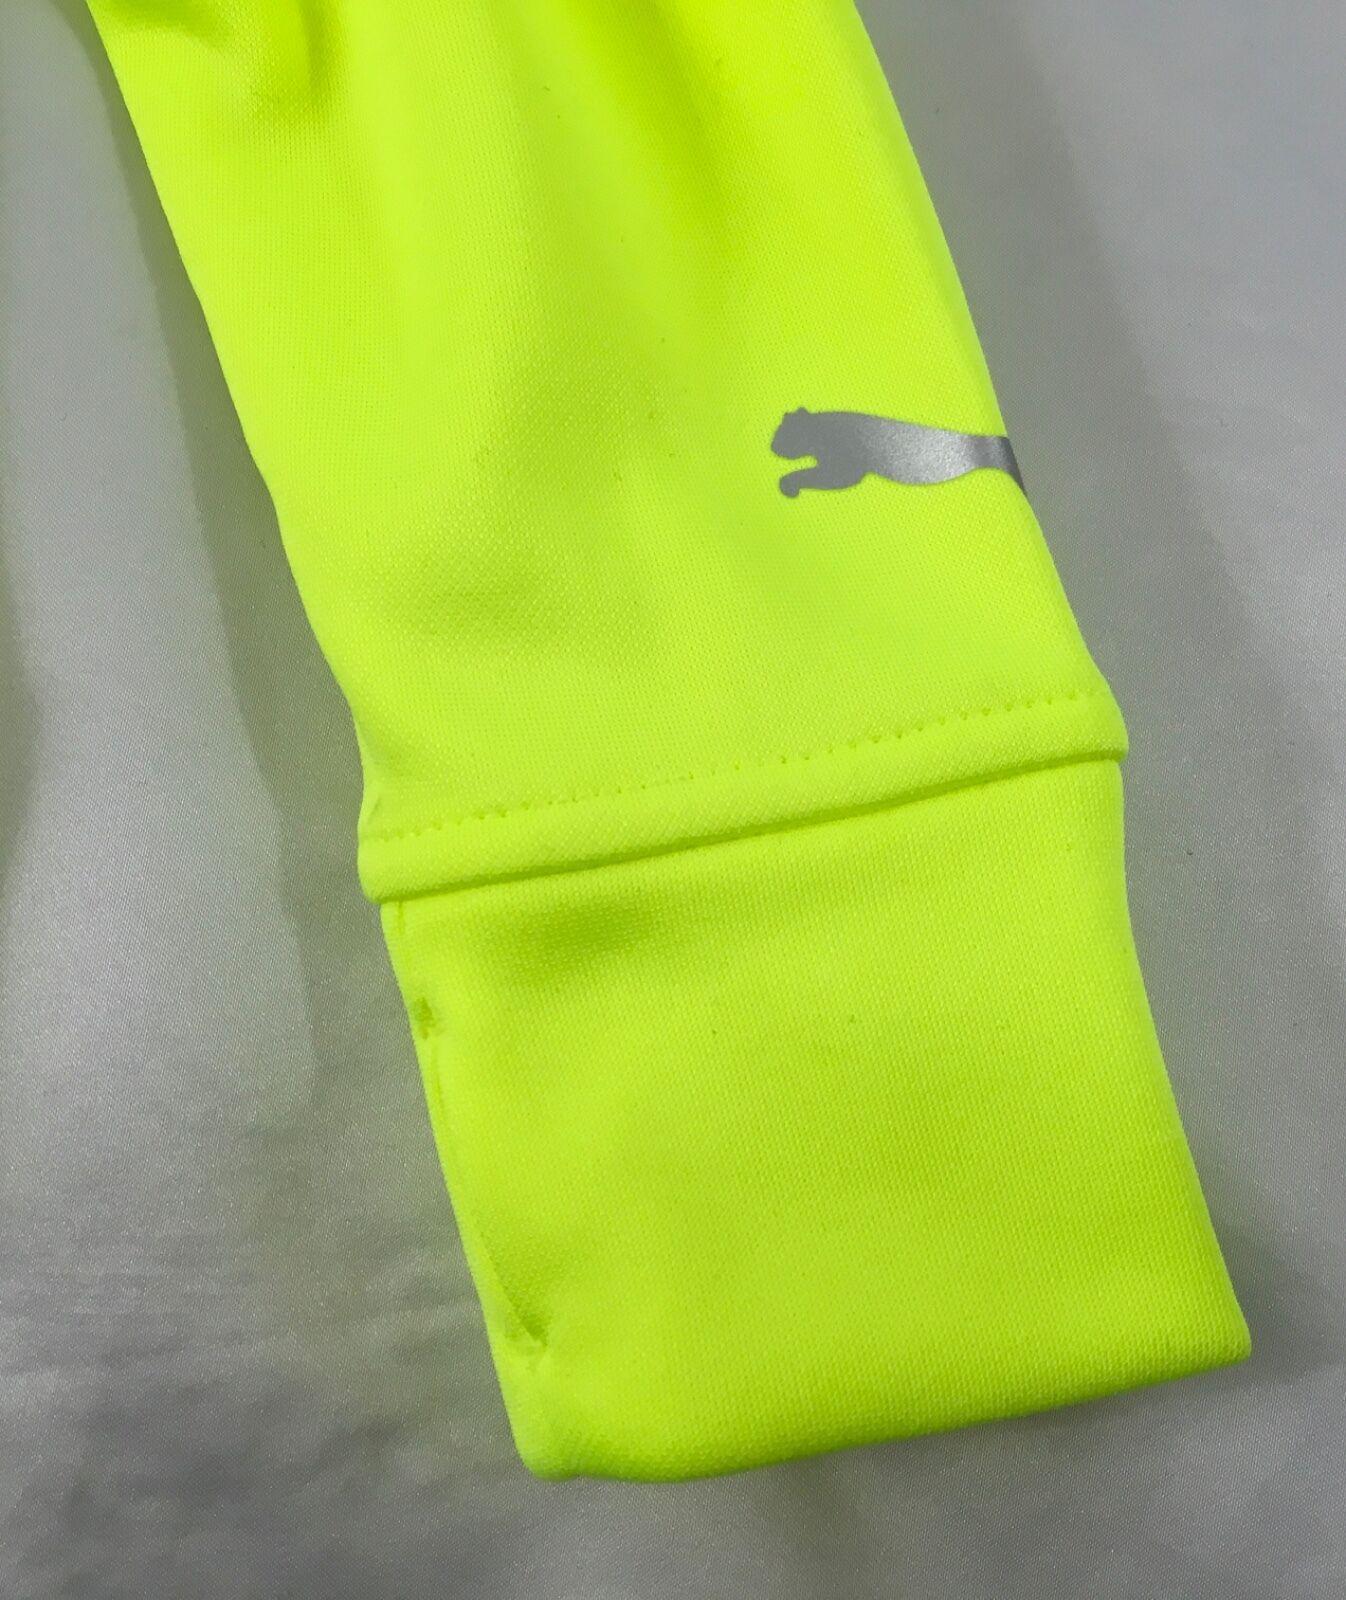 bb050b759a83 PUMA Boy s Sweater Hoodie Acid Yellow Black Logo Kids Size 5 for ...